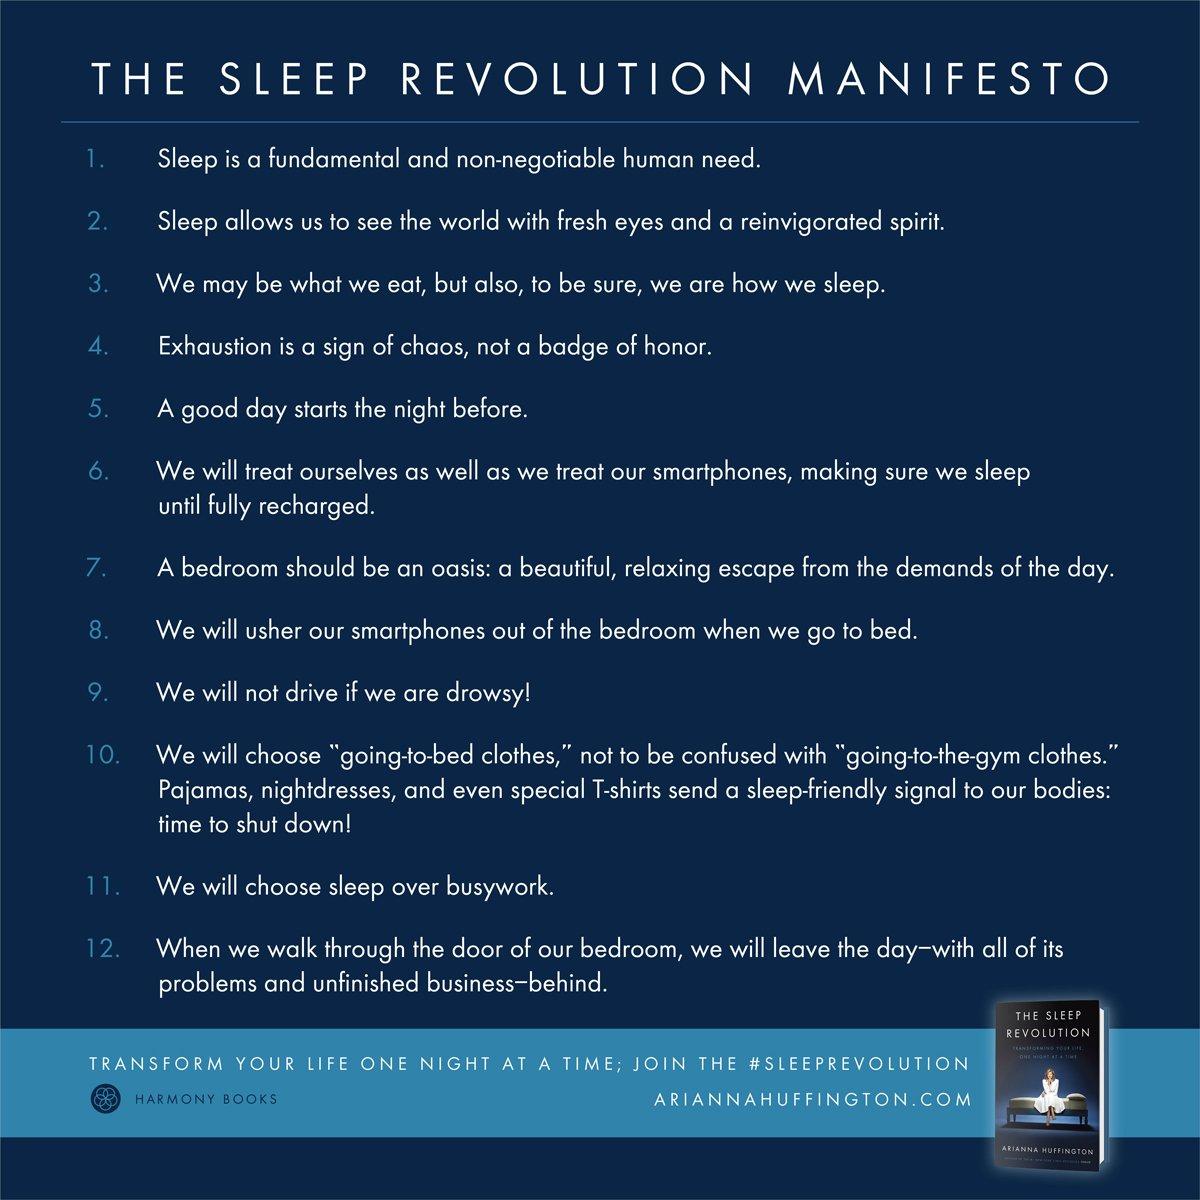 My good friend @ariannahuff has shared 12 tips for a better sleep #SleepRevolution https://t.co/ZZIfs9SPau